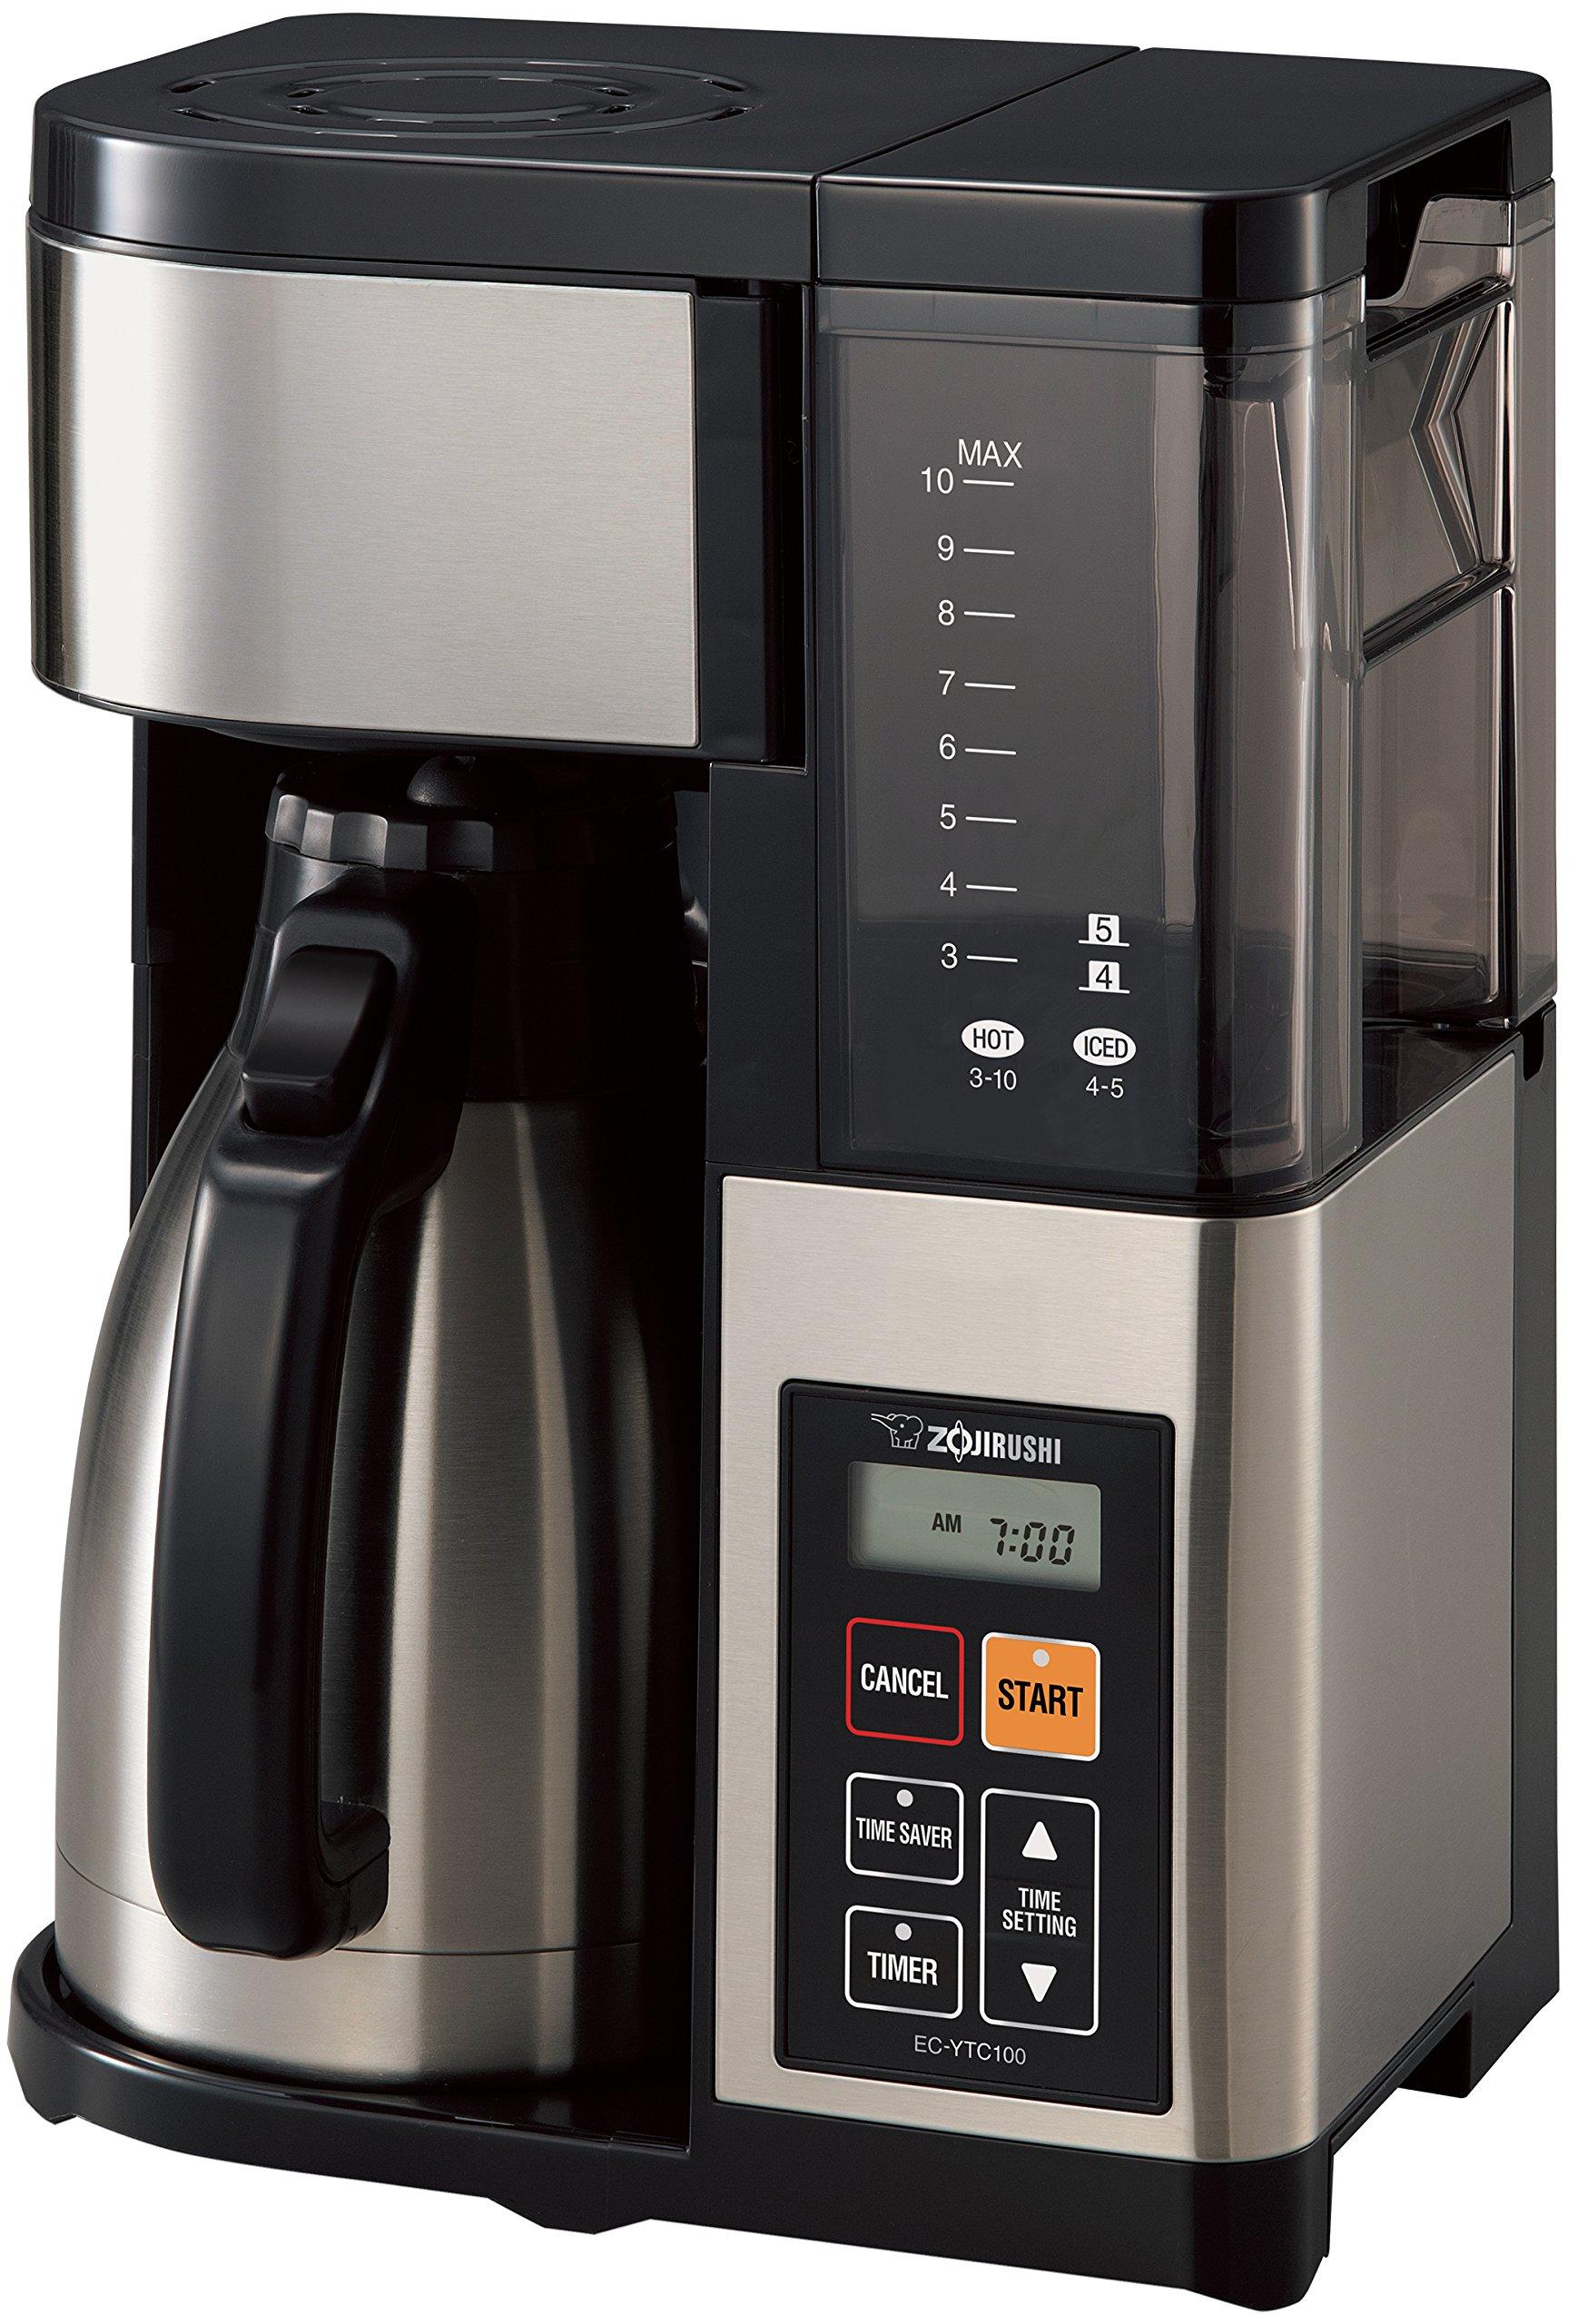 Zojirushi EC-YTC100XB Coffee Maker 10 Cup Stainless Steel/Black